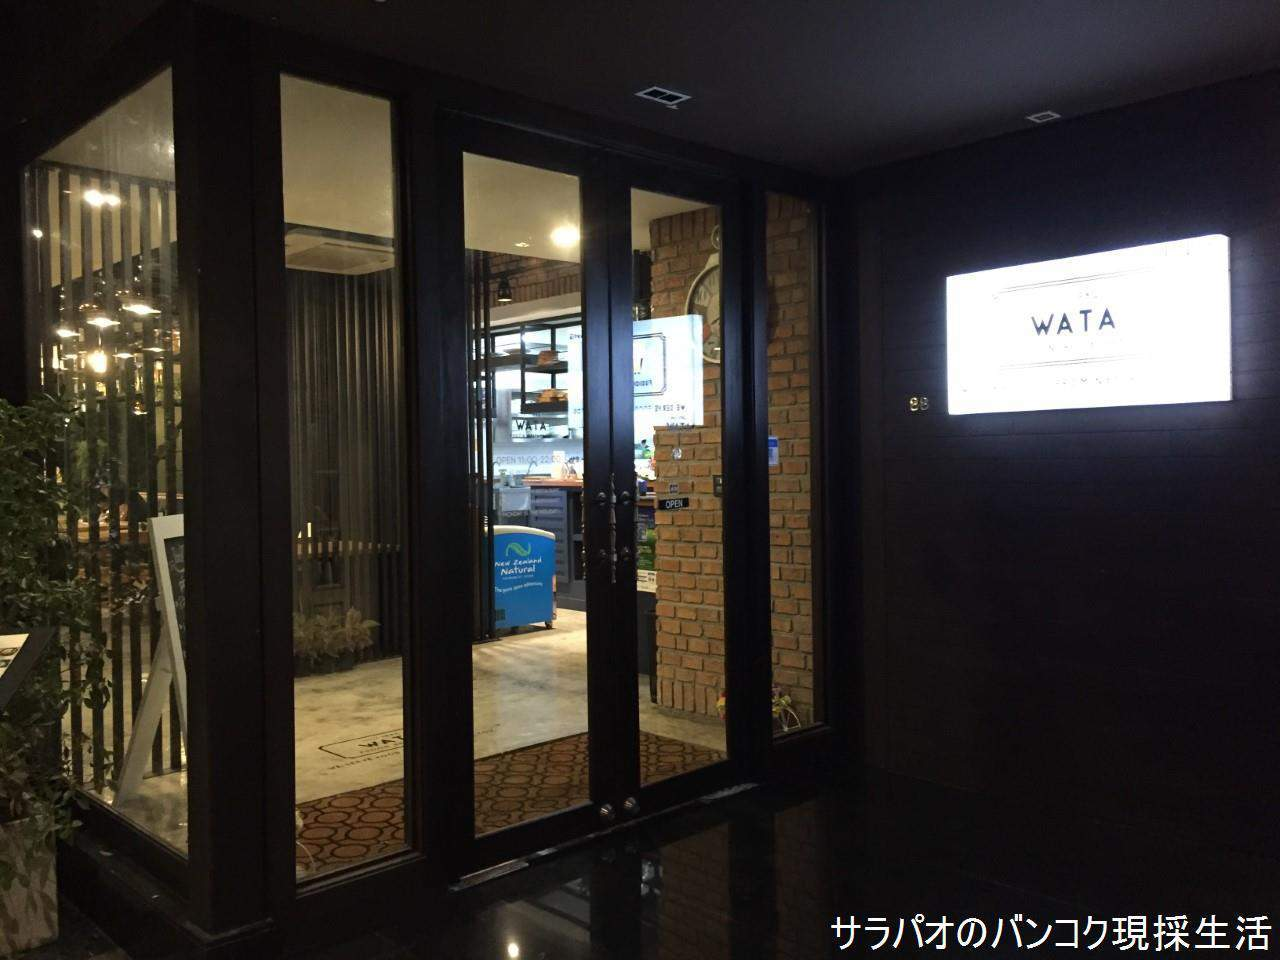 Wata_24.jpg